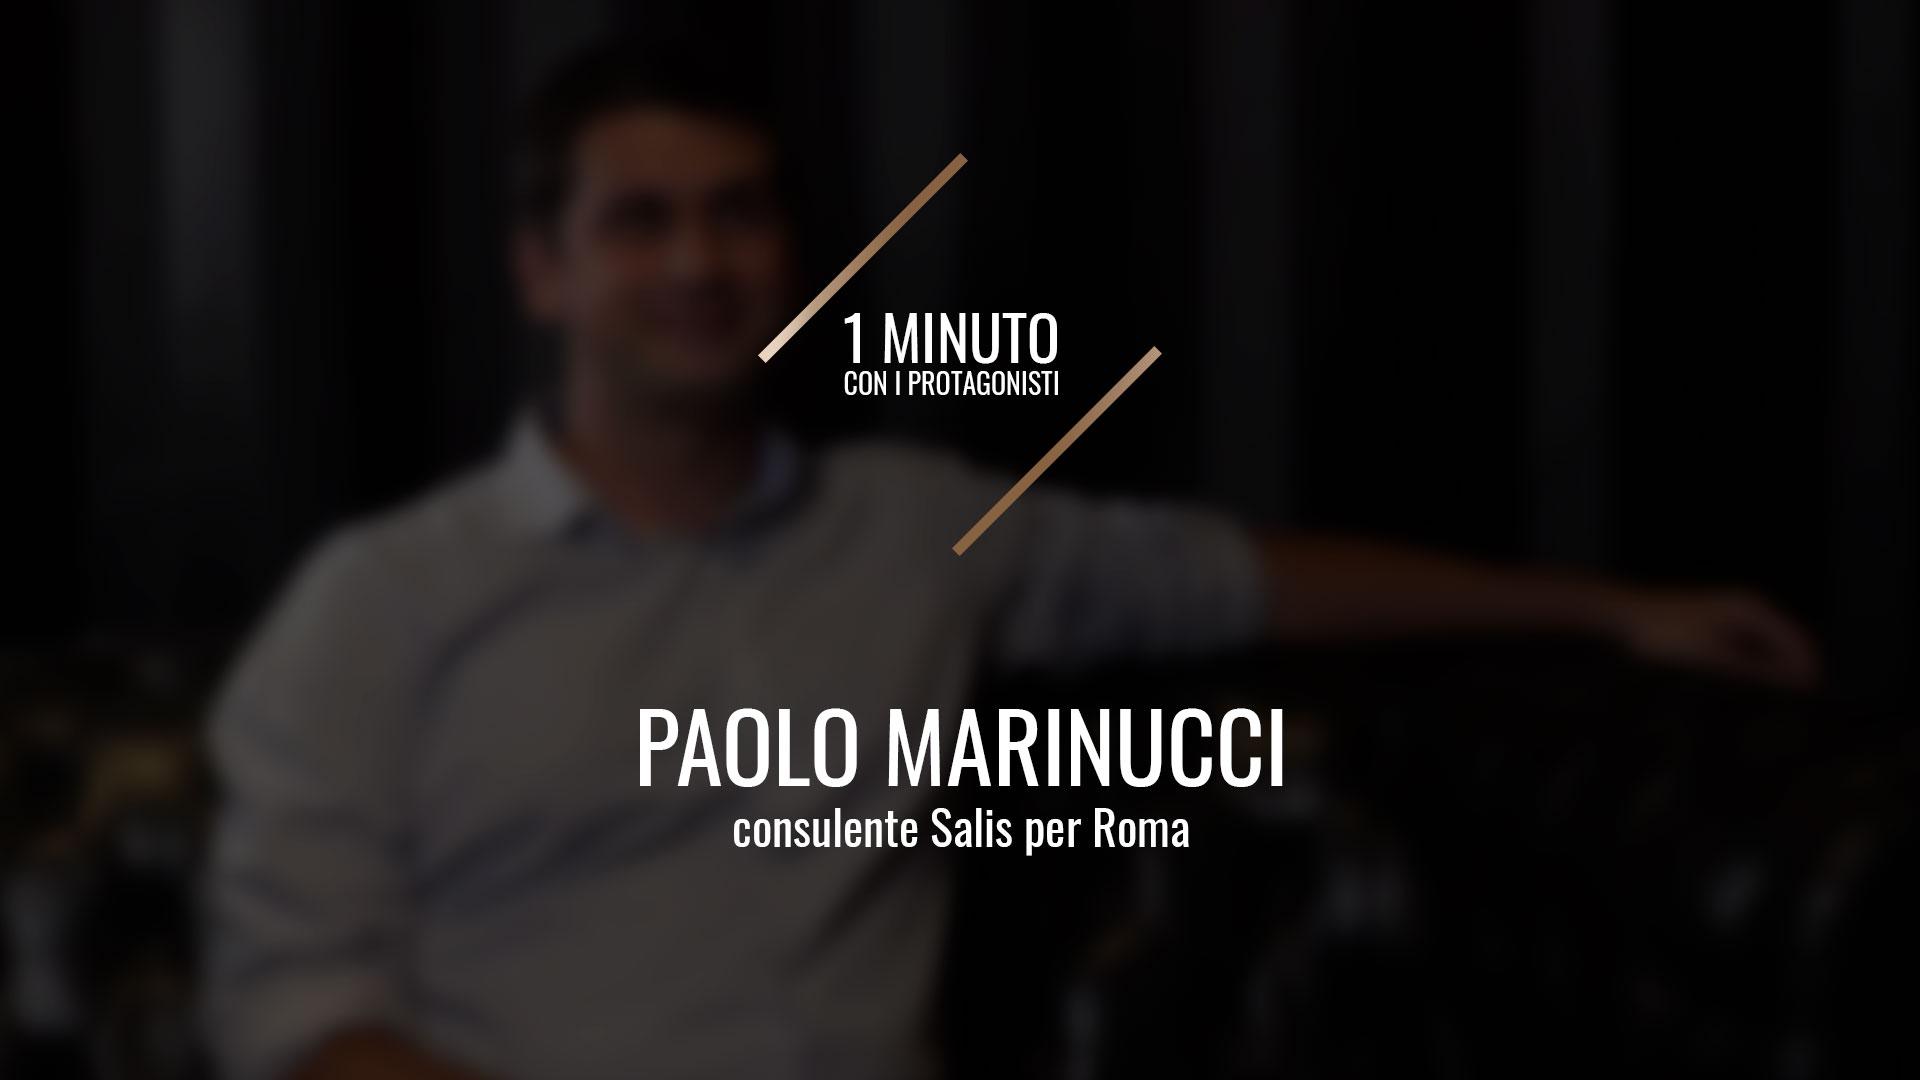 Paolo Marinucci, referente Salis Roma